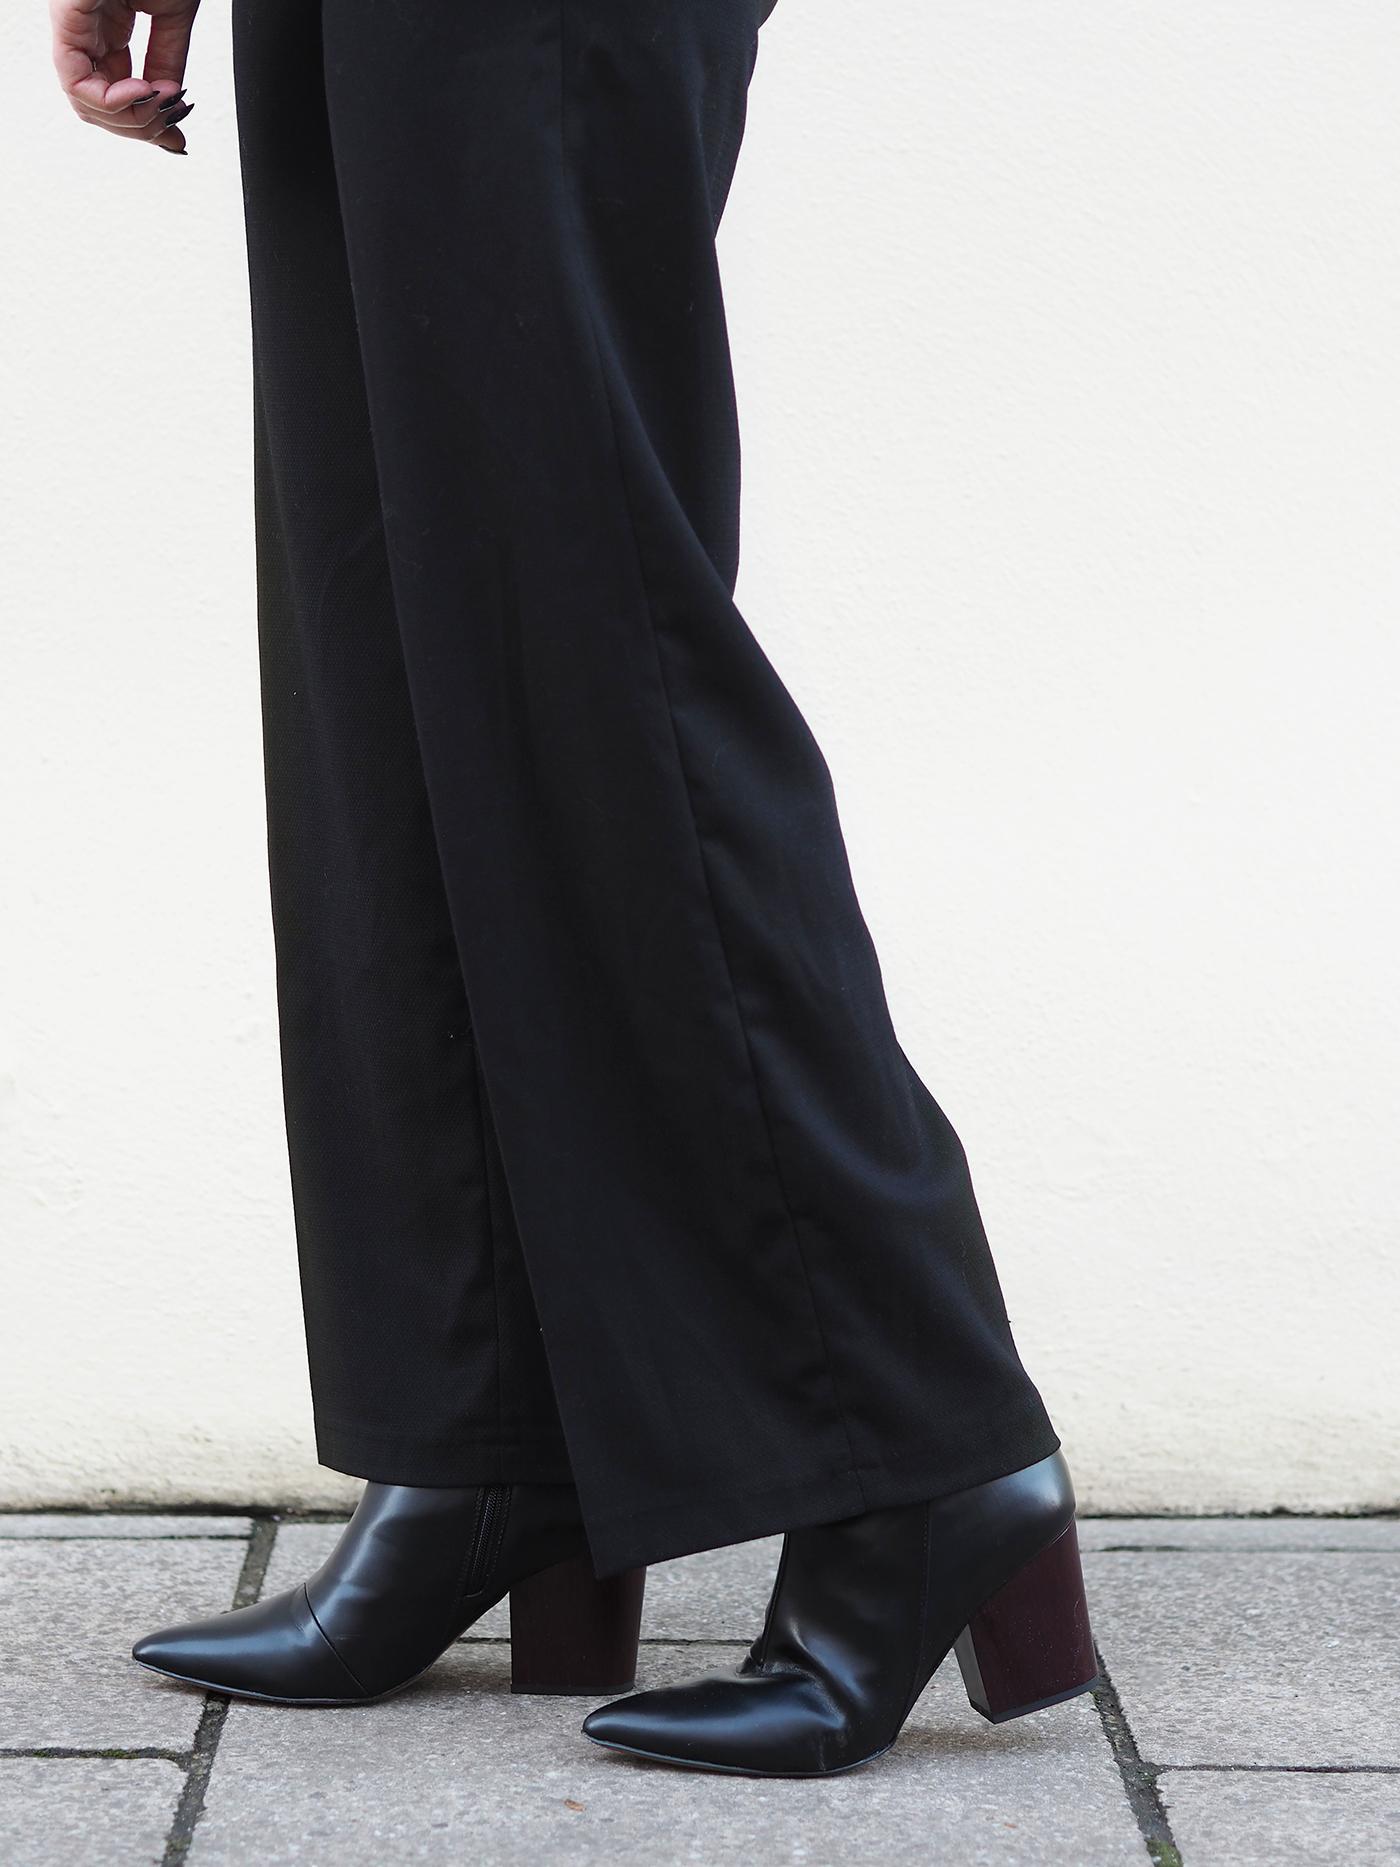 heeled black boots Next